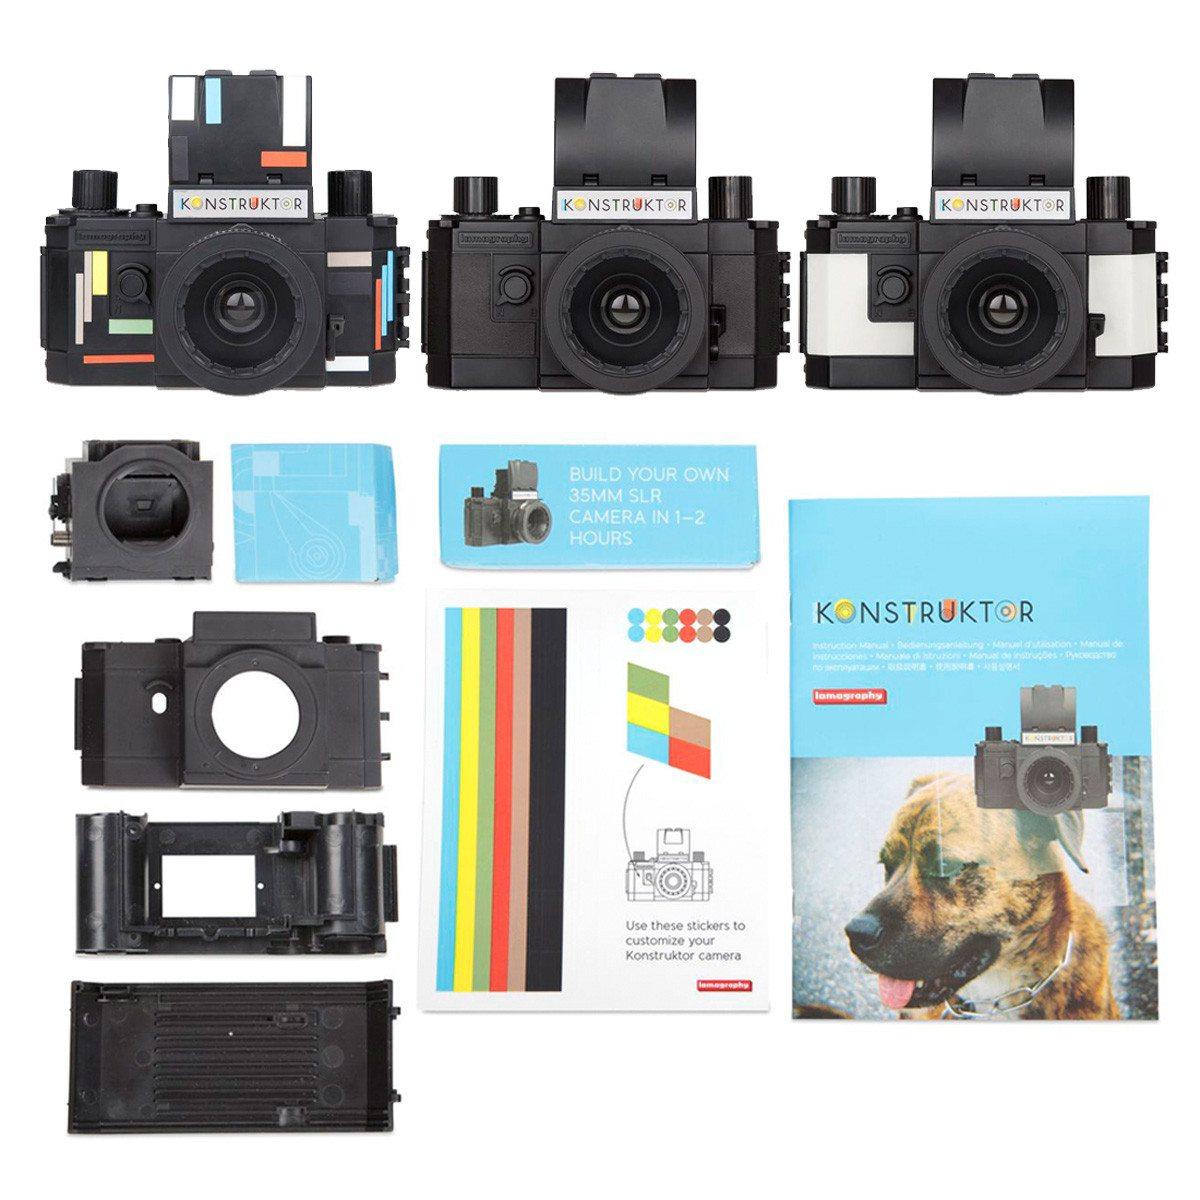 Cámara Lomo Konstruktor - Construye tu propia cámara reflex